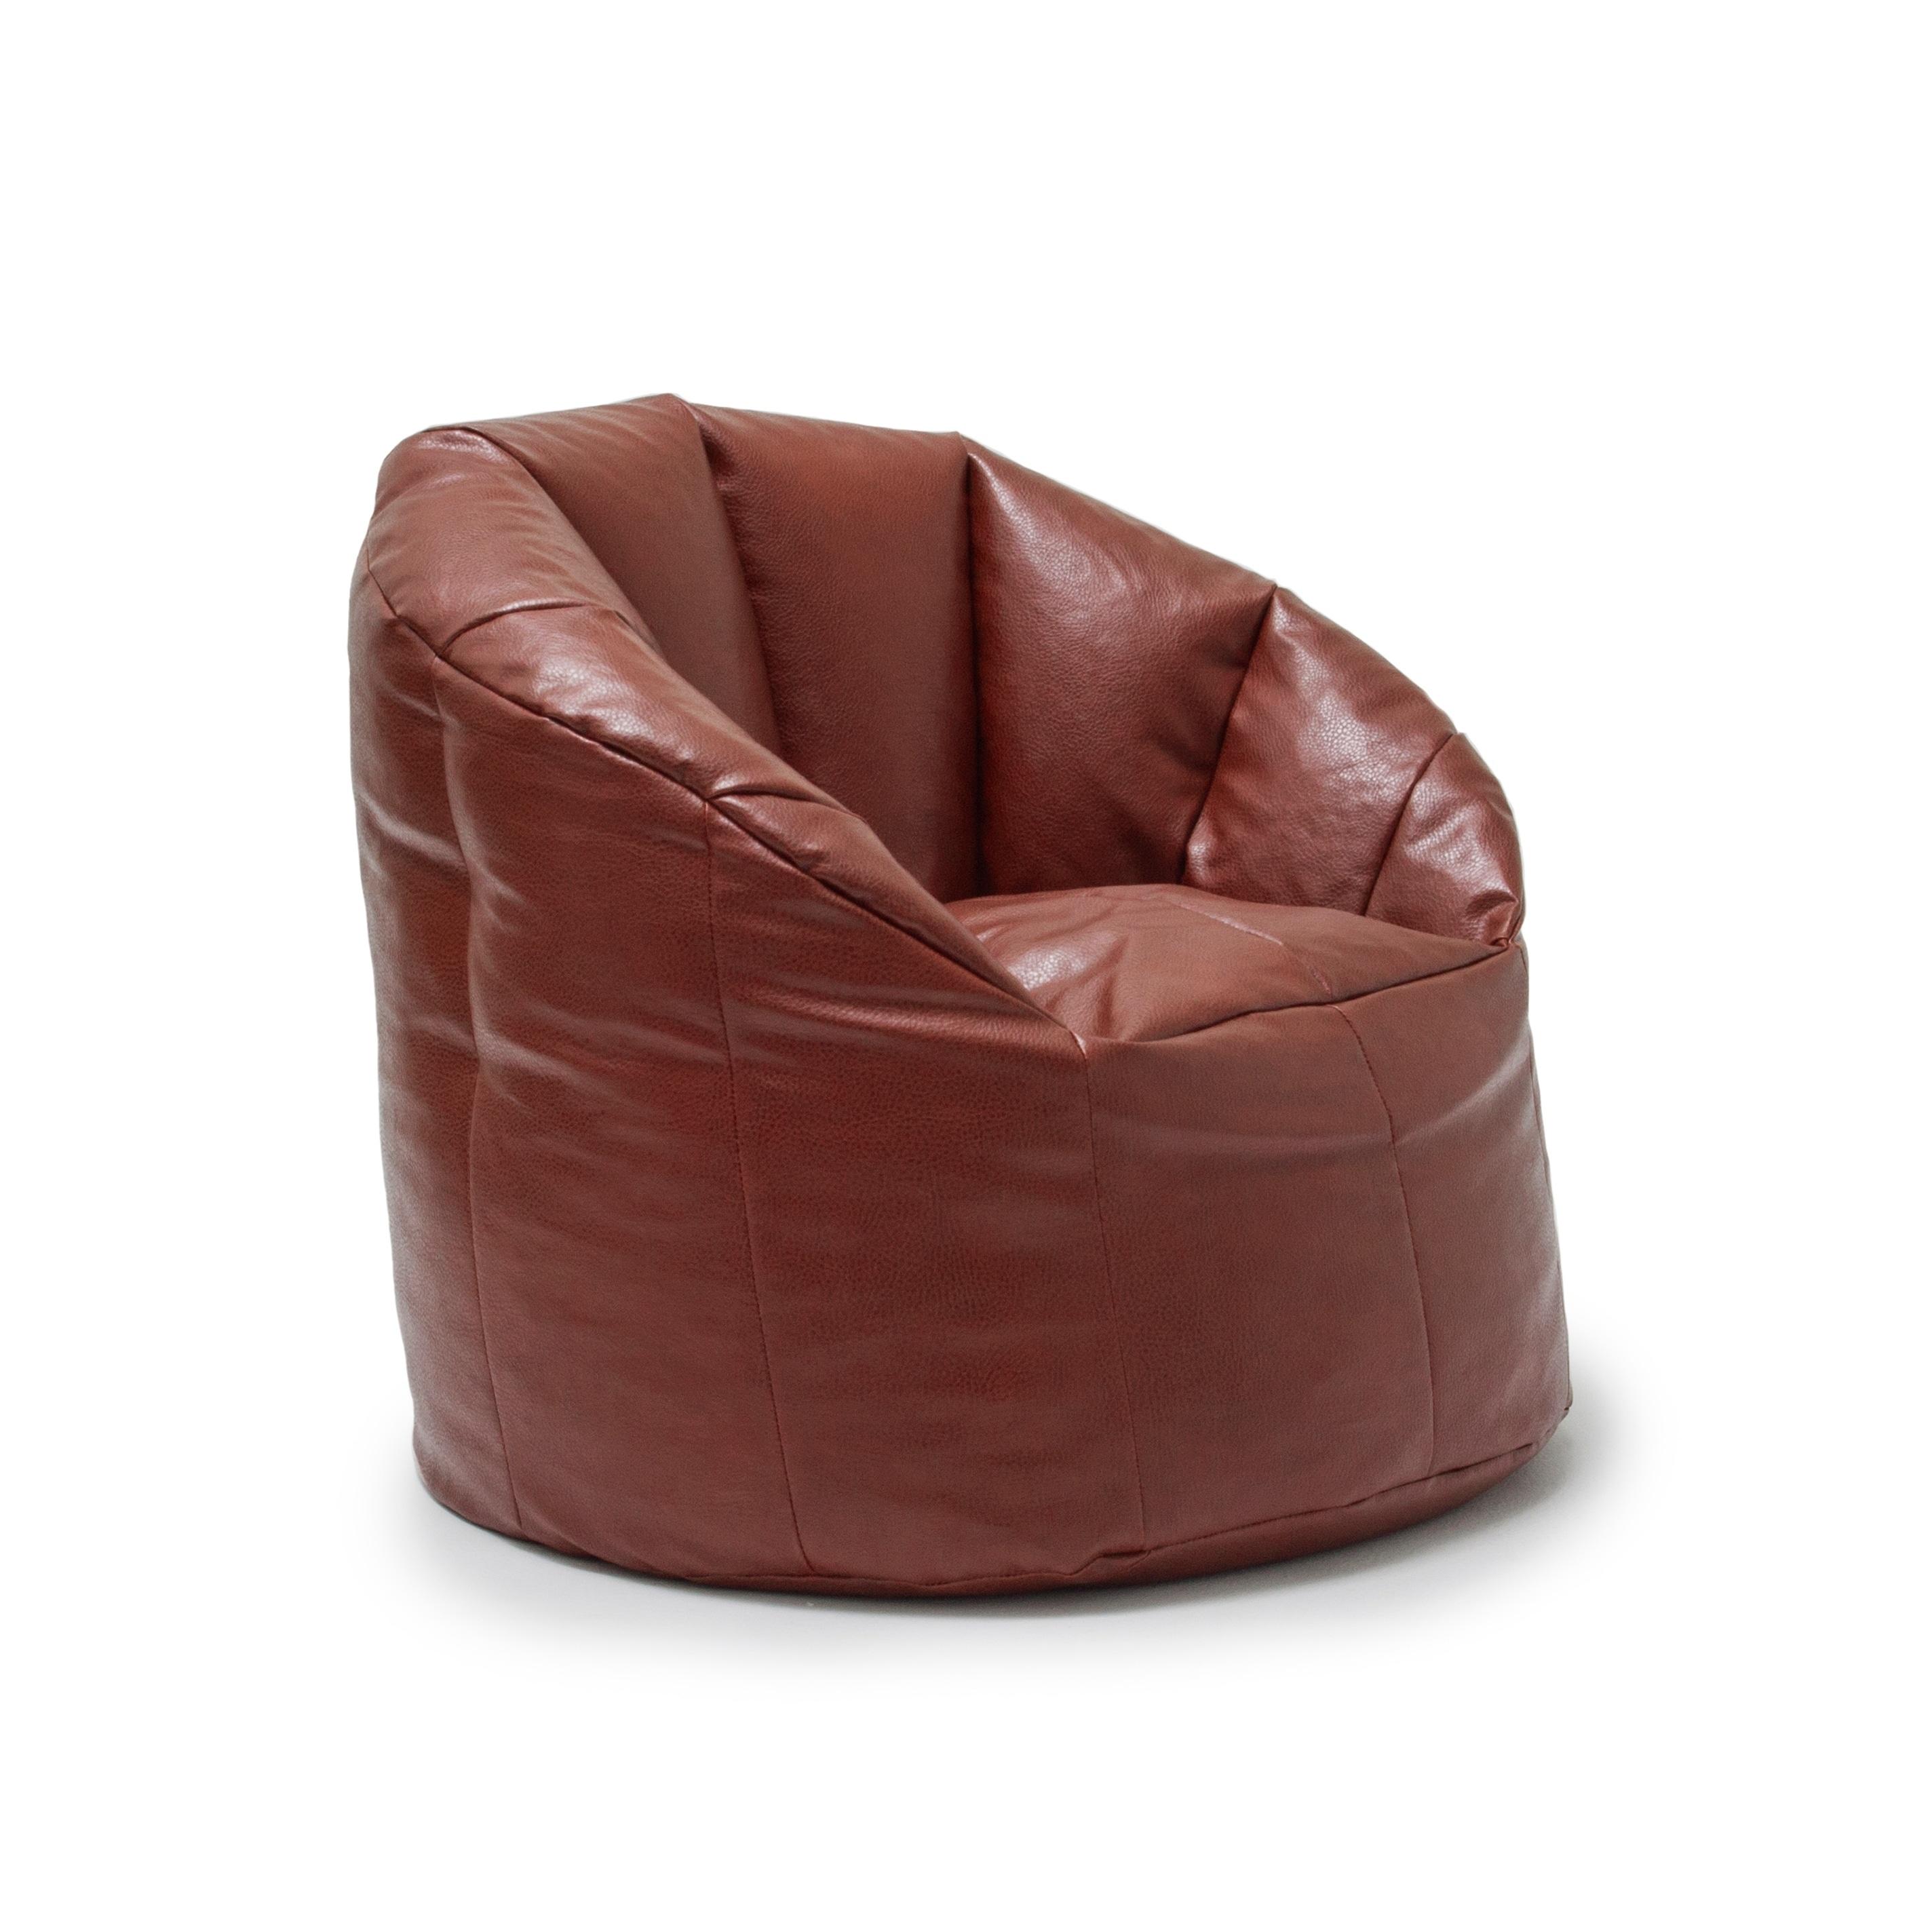 Shop Big Joe Lux Milano Vegan Leather Bean Bag Chair Multiple